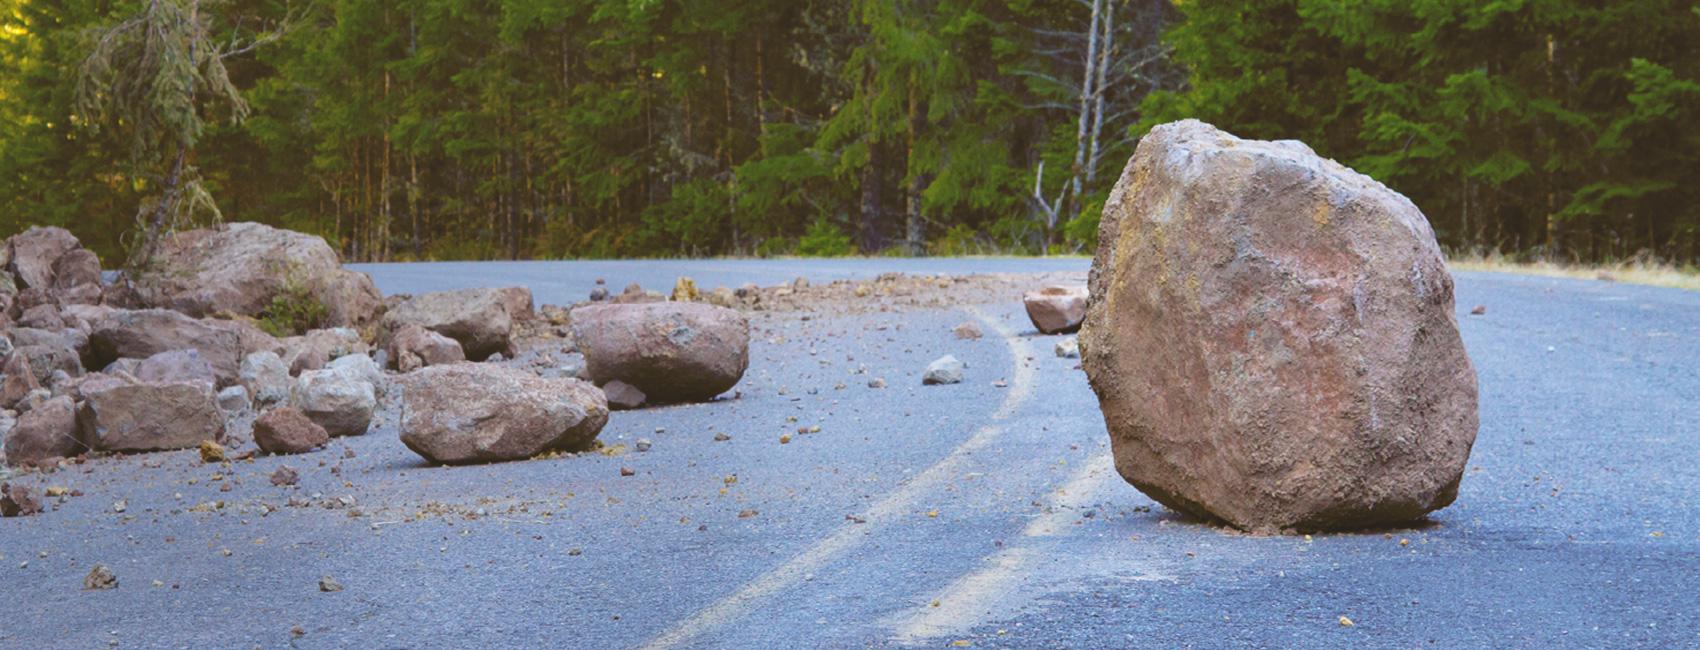 201407_roadblocks_full